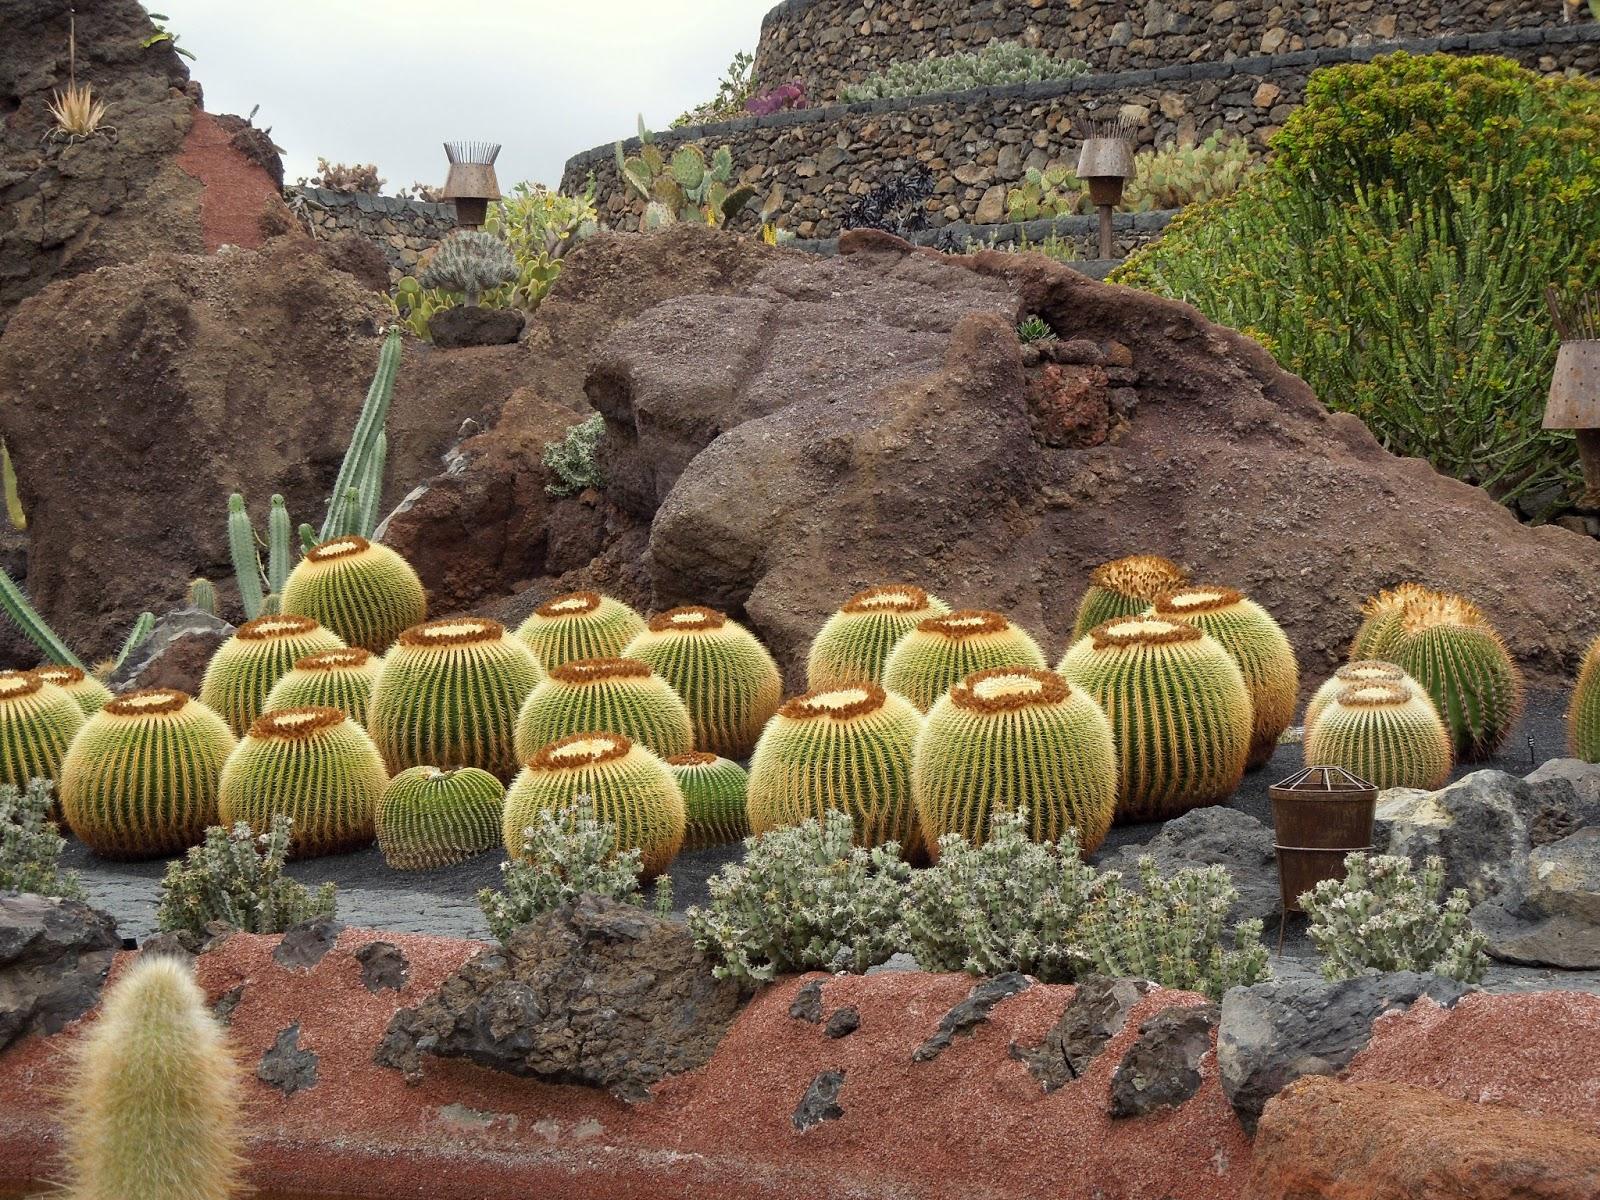 Jard n de cactus de lanzarote echinocactus bot nic serrat for Jardin de cactus lanzarote